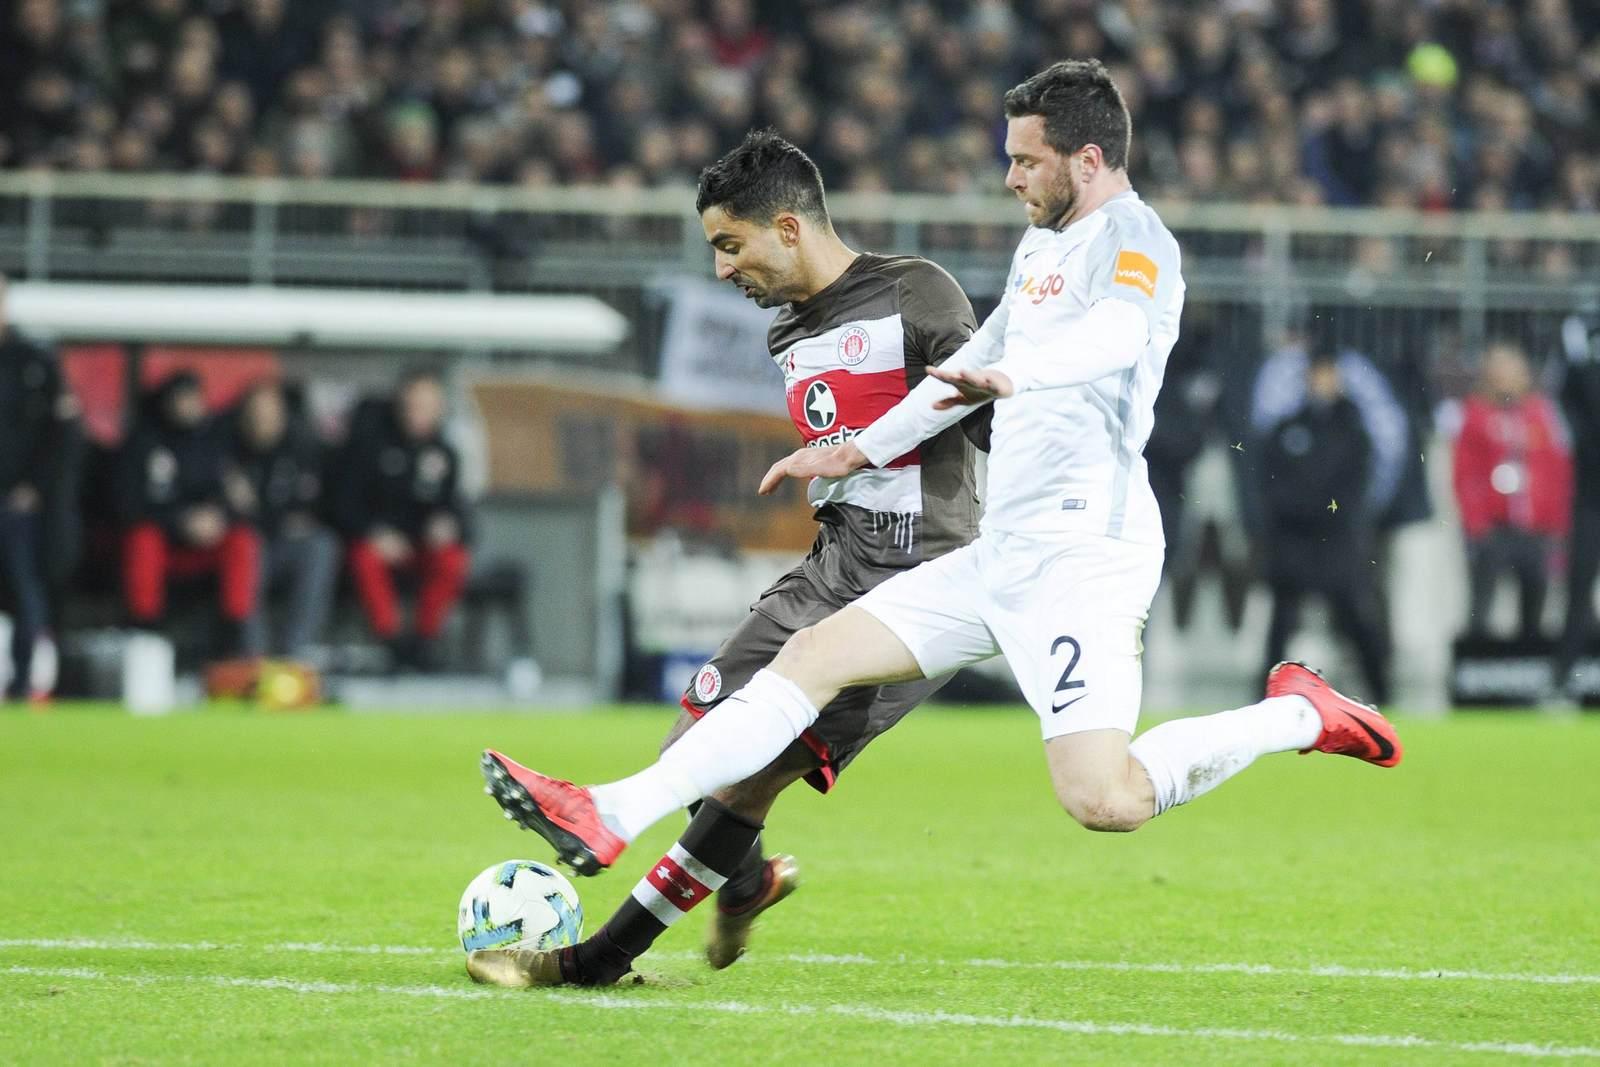 Bochum vs St. Pauli Football Prediction 10/12/2018